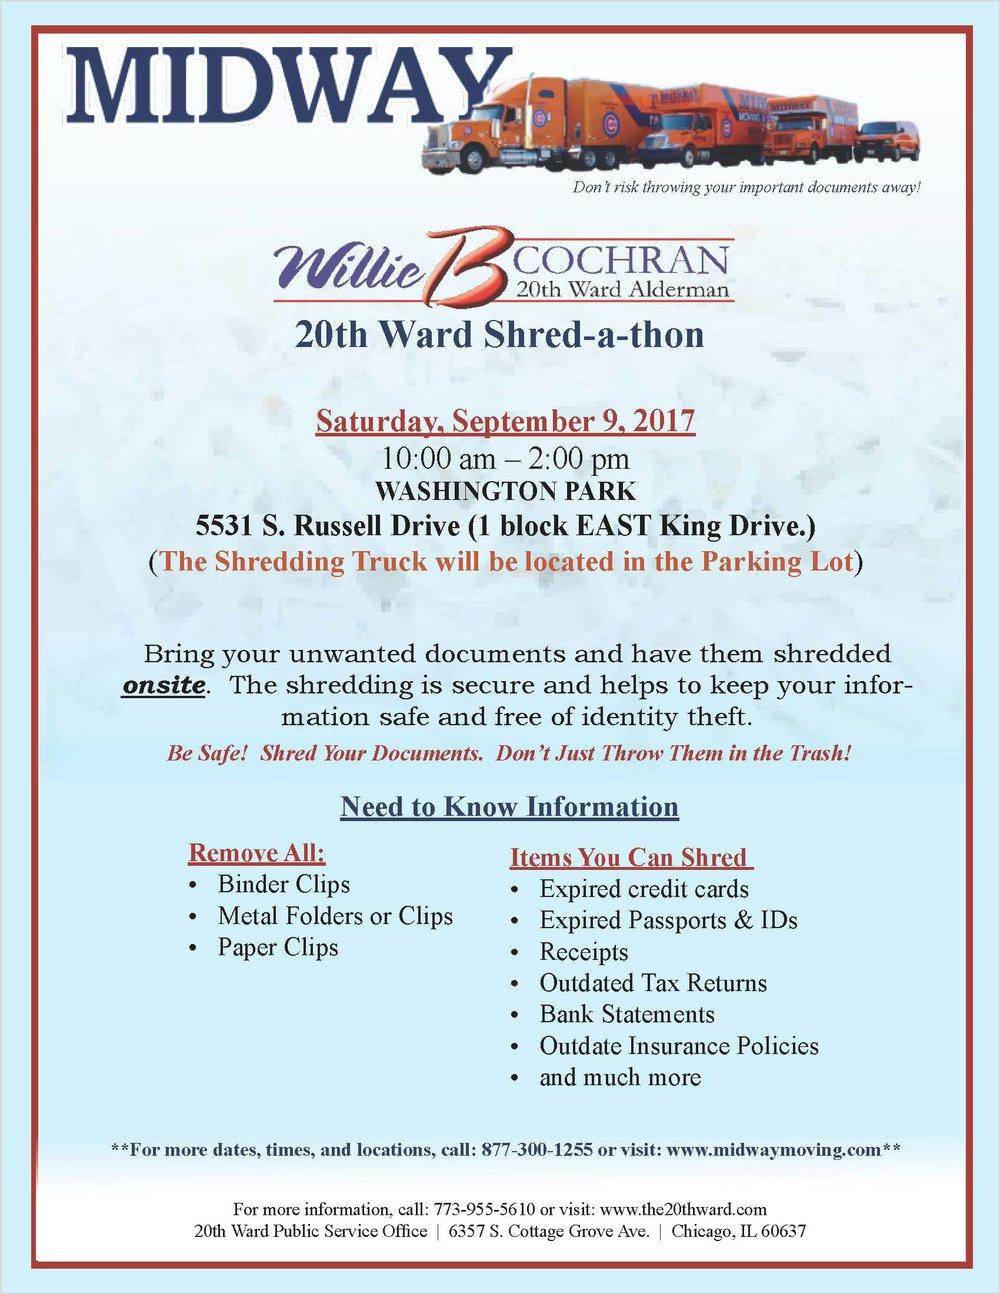 Shredathon flyer 2017 - Washington Park Refectory1.jpg